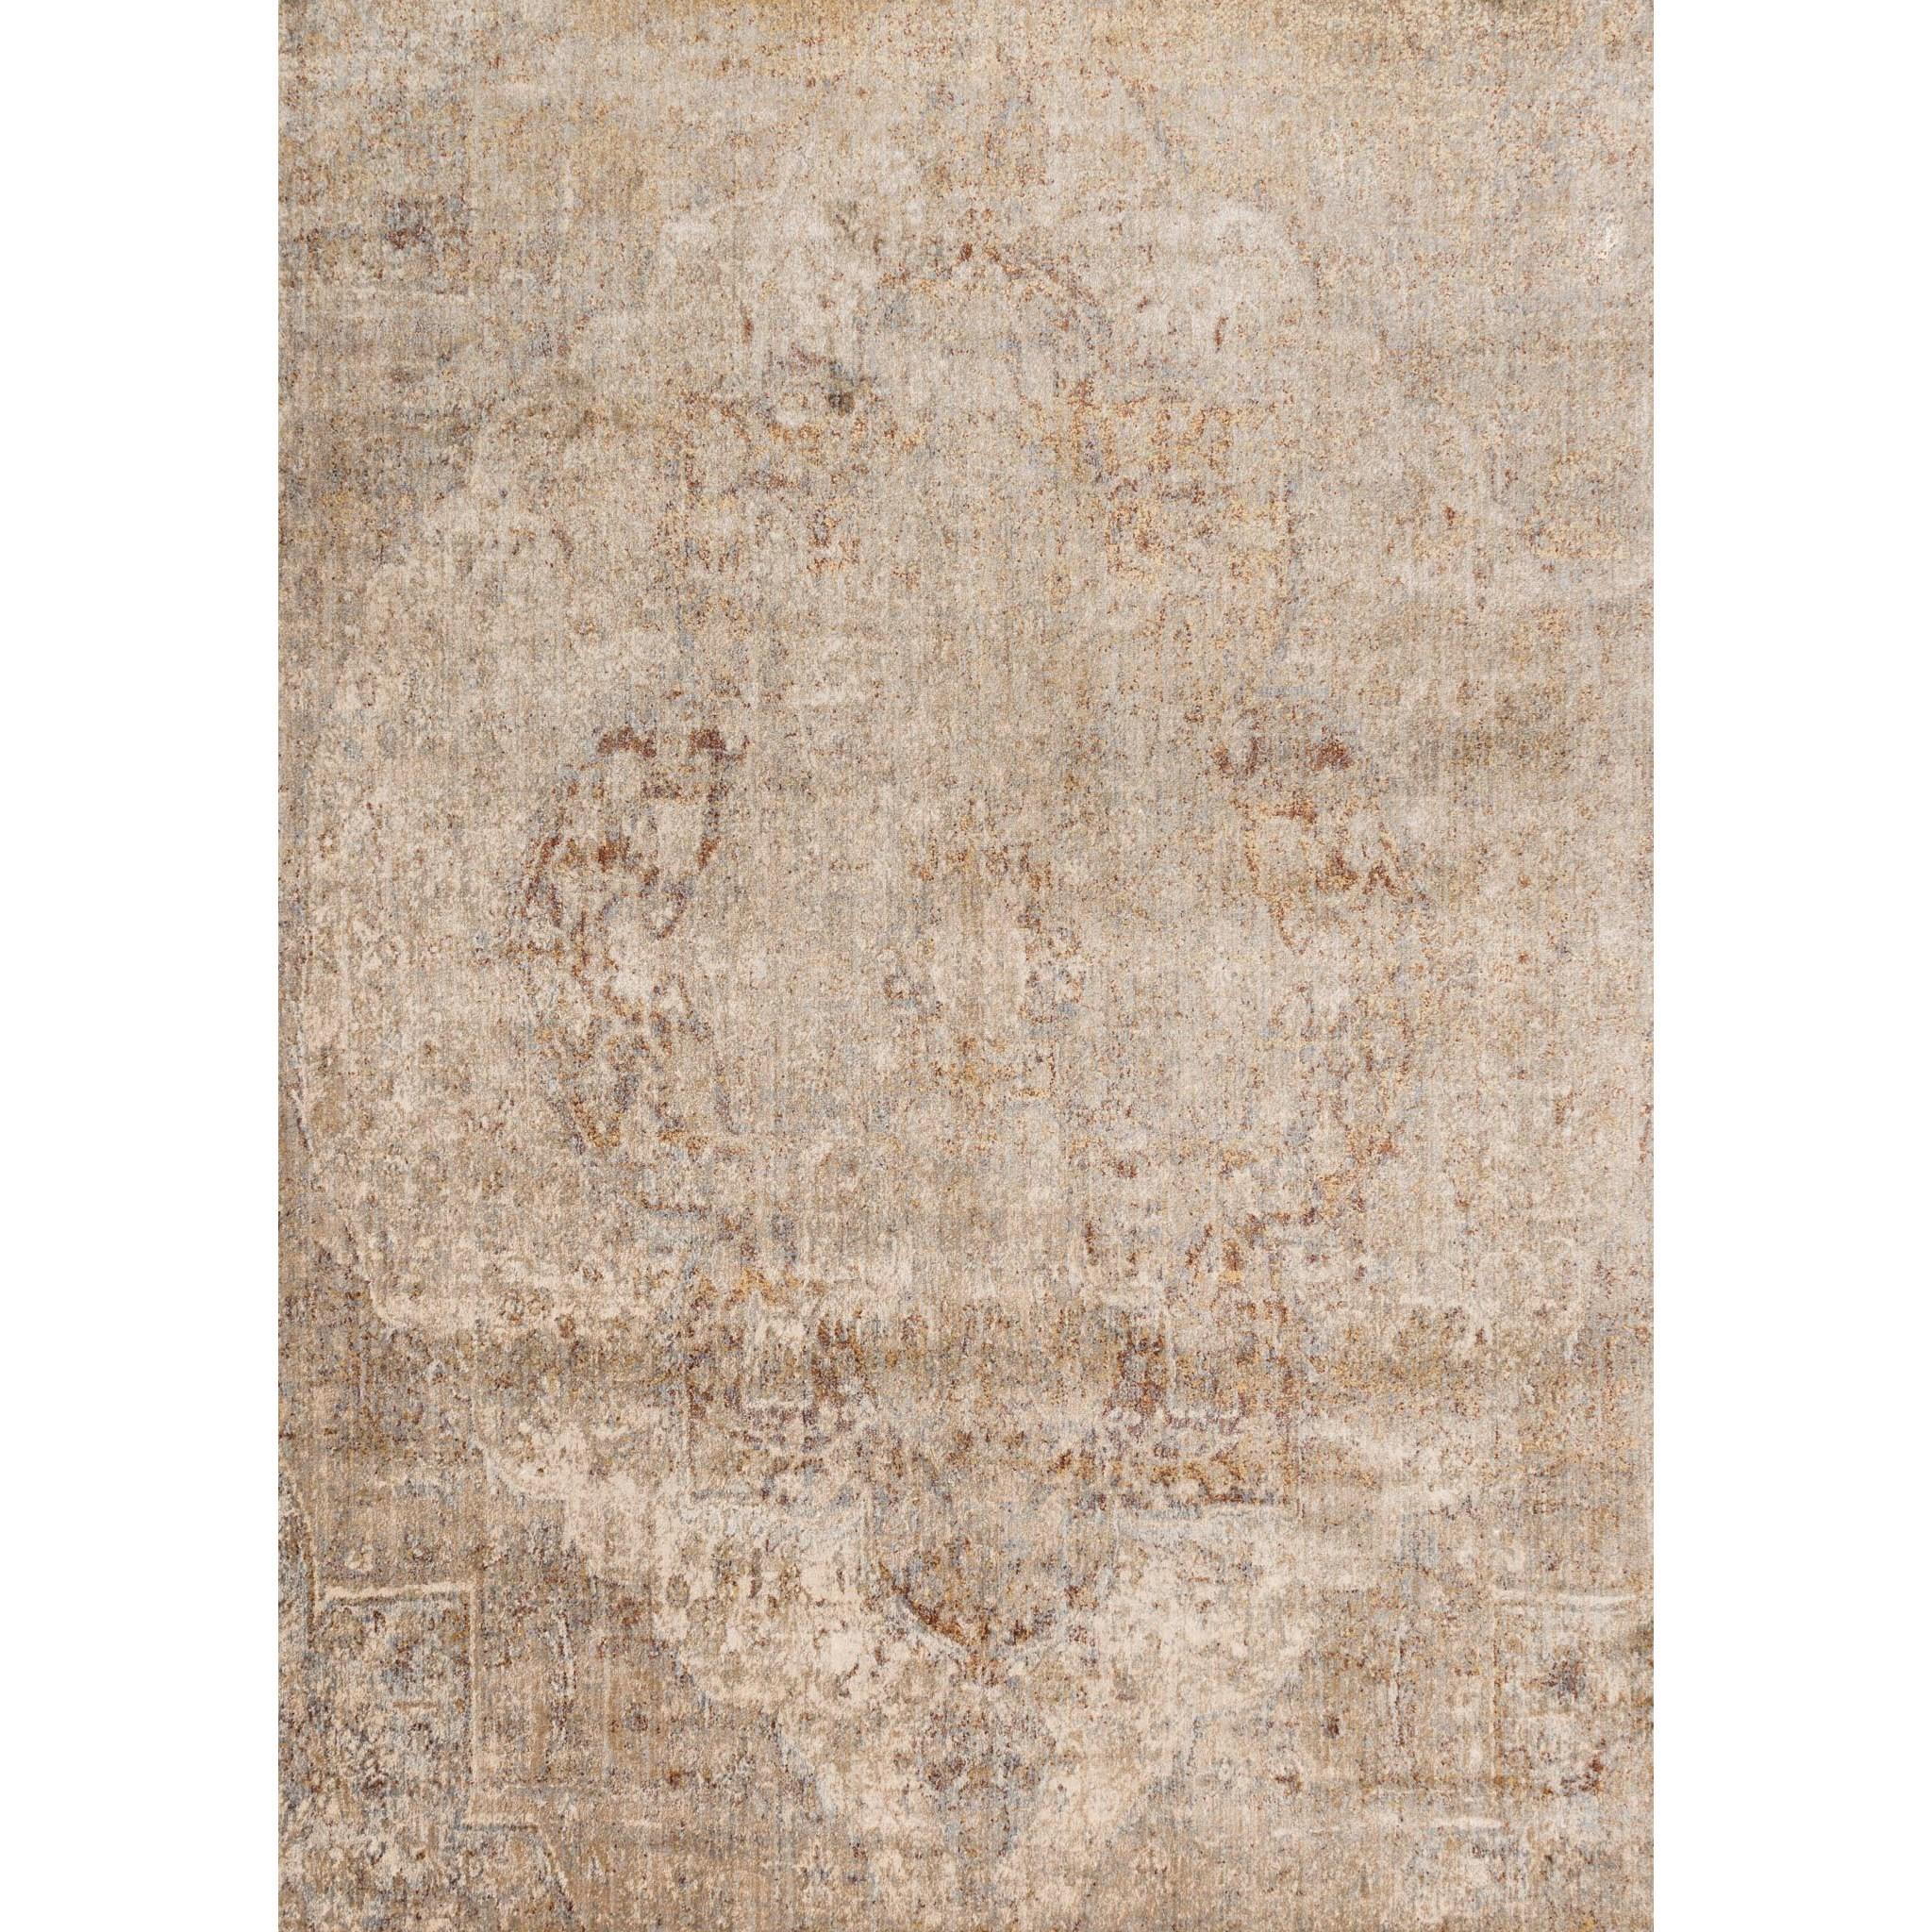 "Anastasia 12'-0"" x 15'-0"" Area Rug by Loloi Rugs at Virginia Furniture Market"